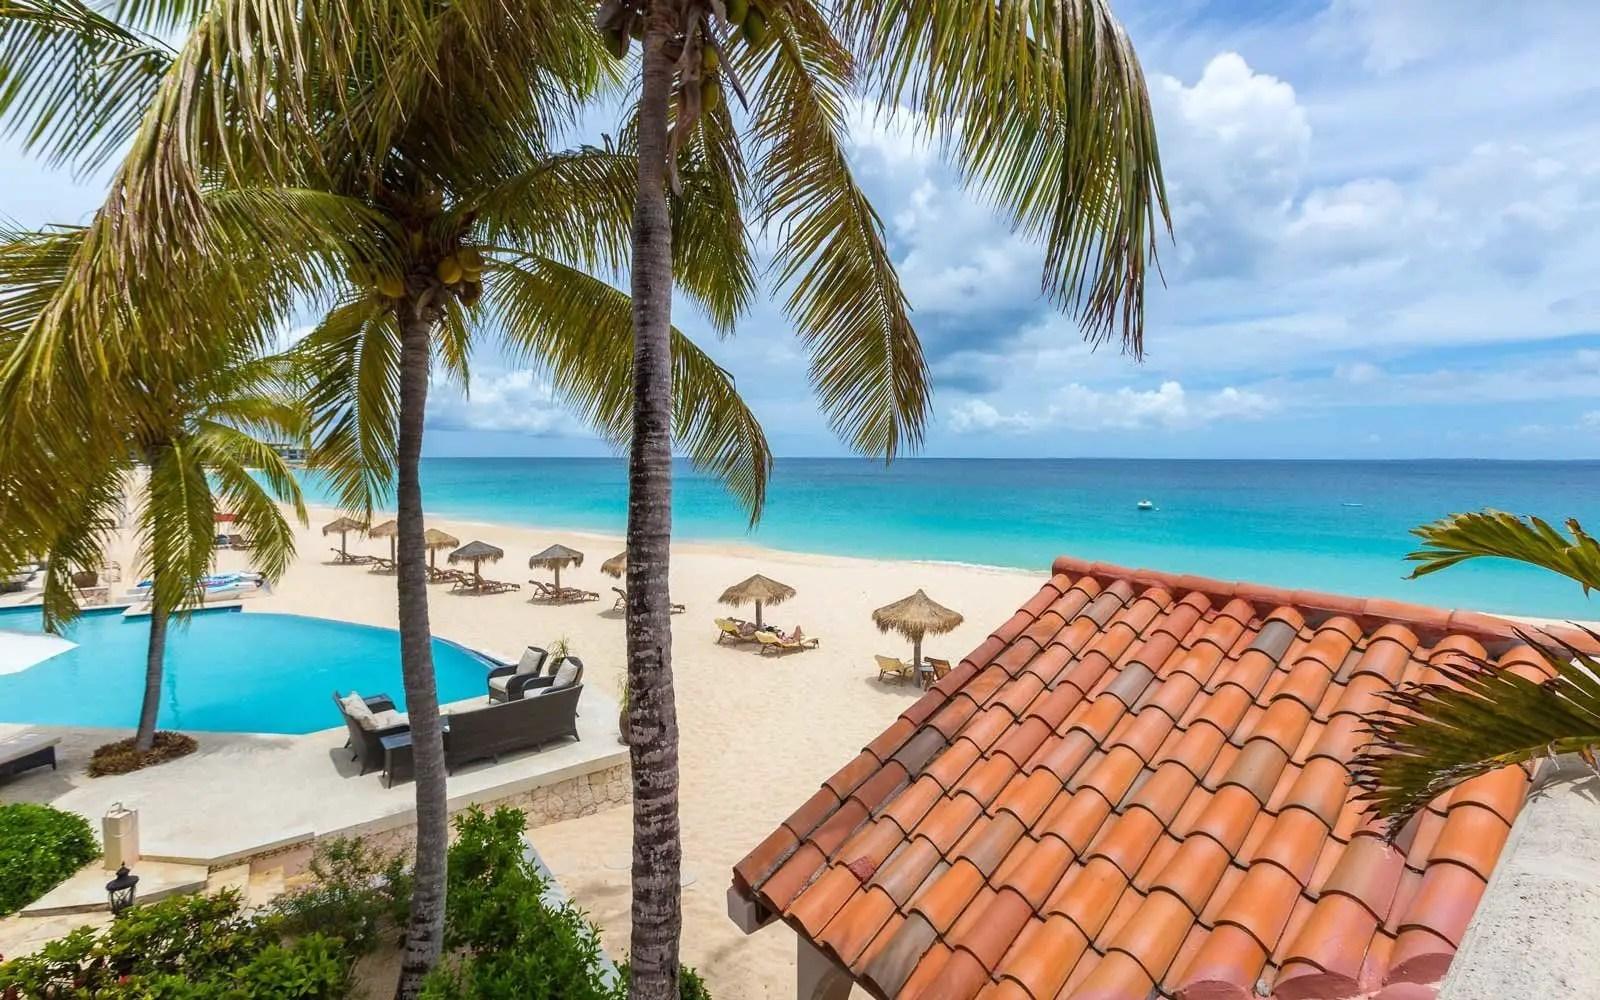 Caribbean Island Tour – a Quick Overview